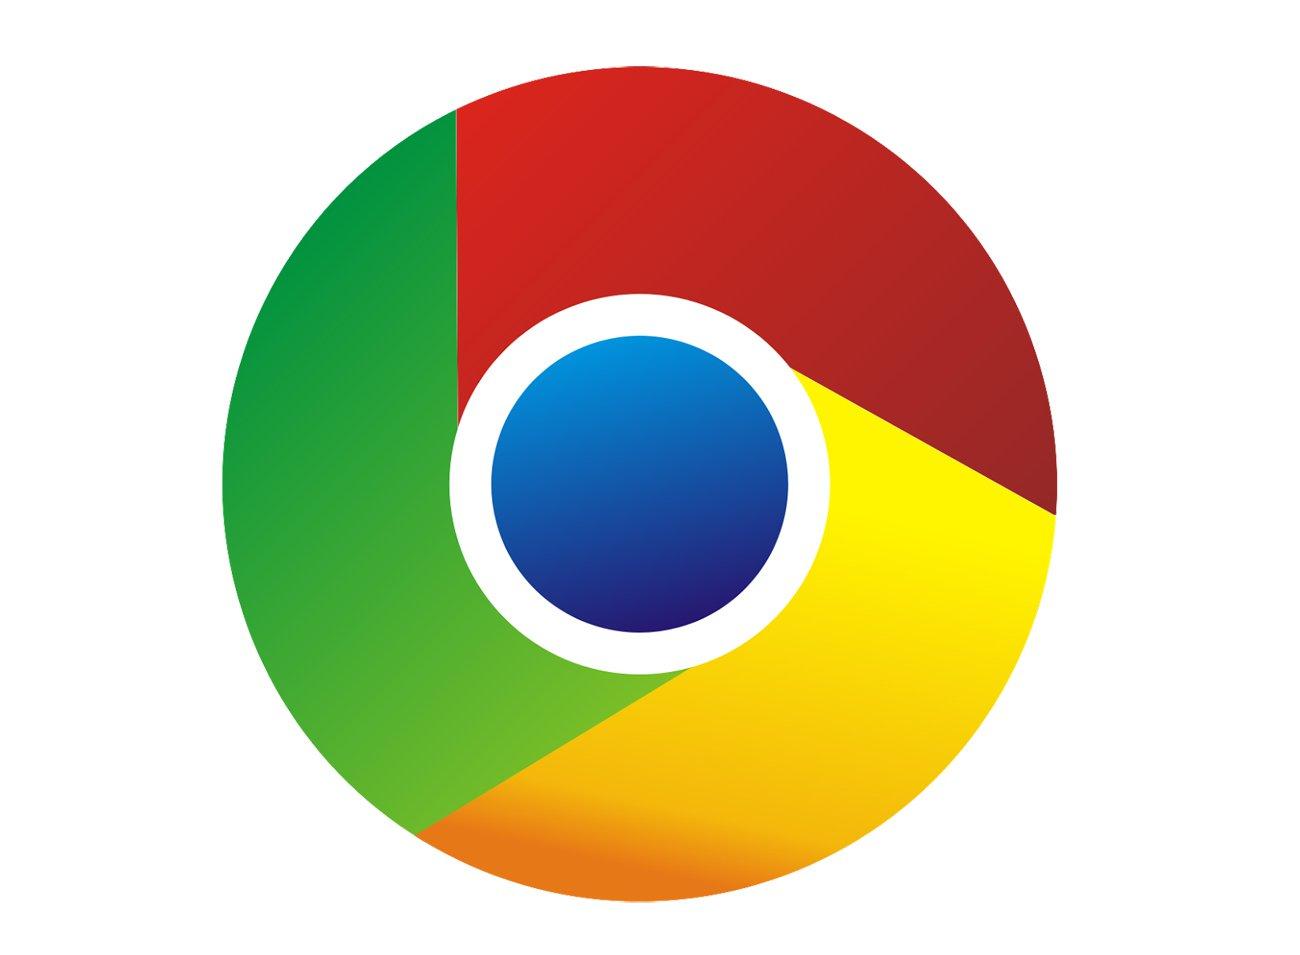 Chrome Logo, Chrome Symbol, Meaning, History and Evolution